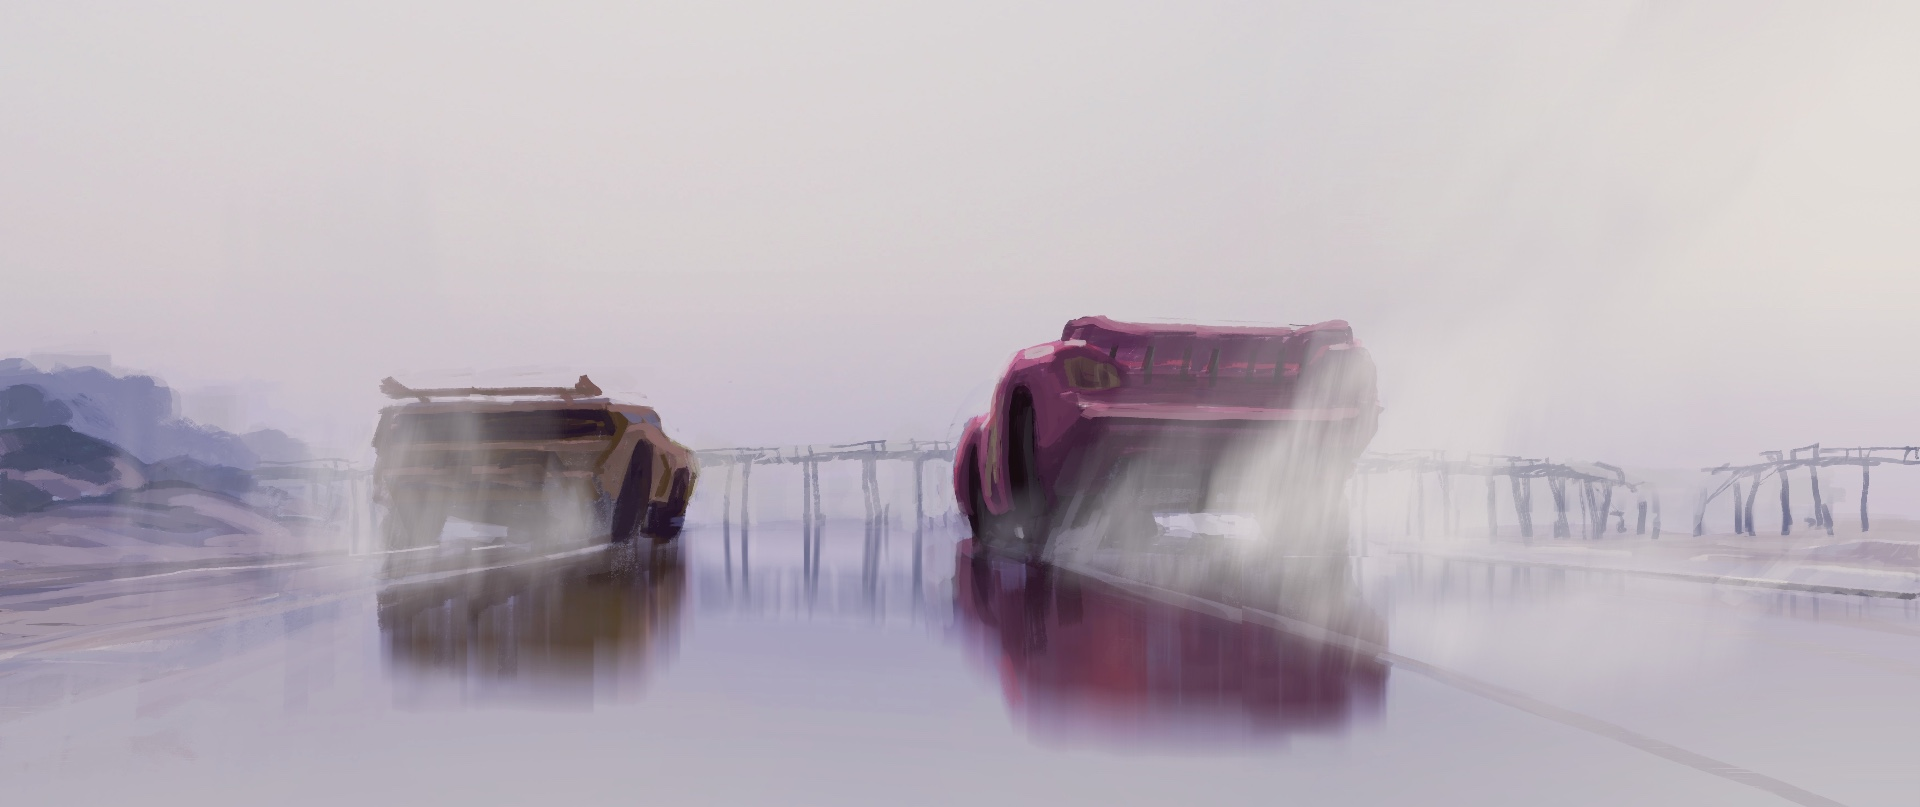 Klocek-Noah-Cars-3-Concept-Art-02.jpg